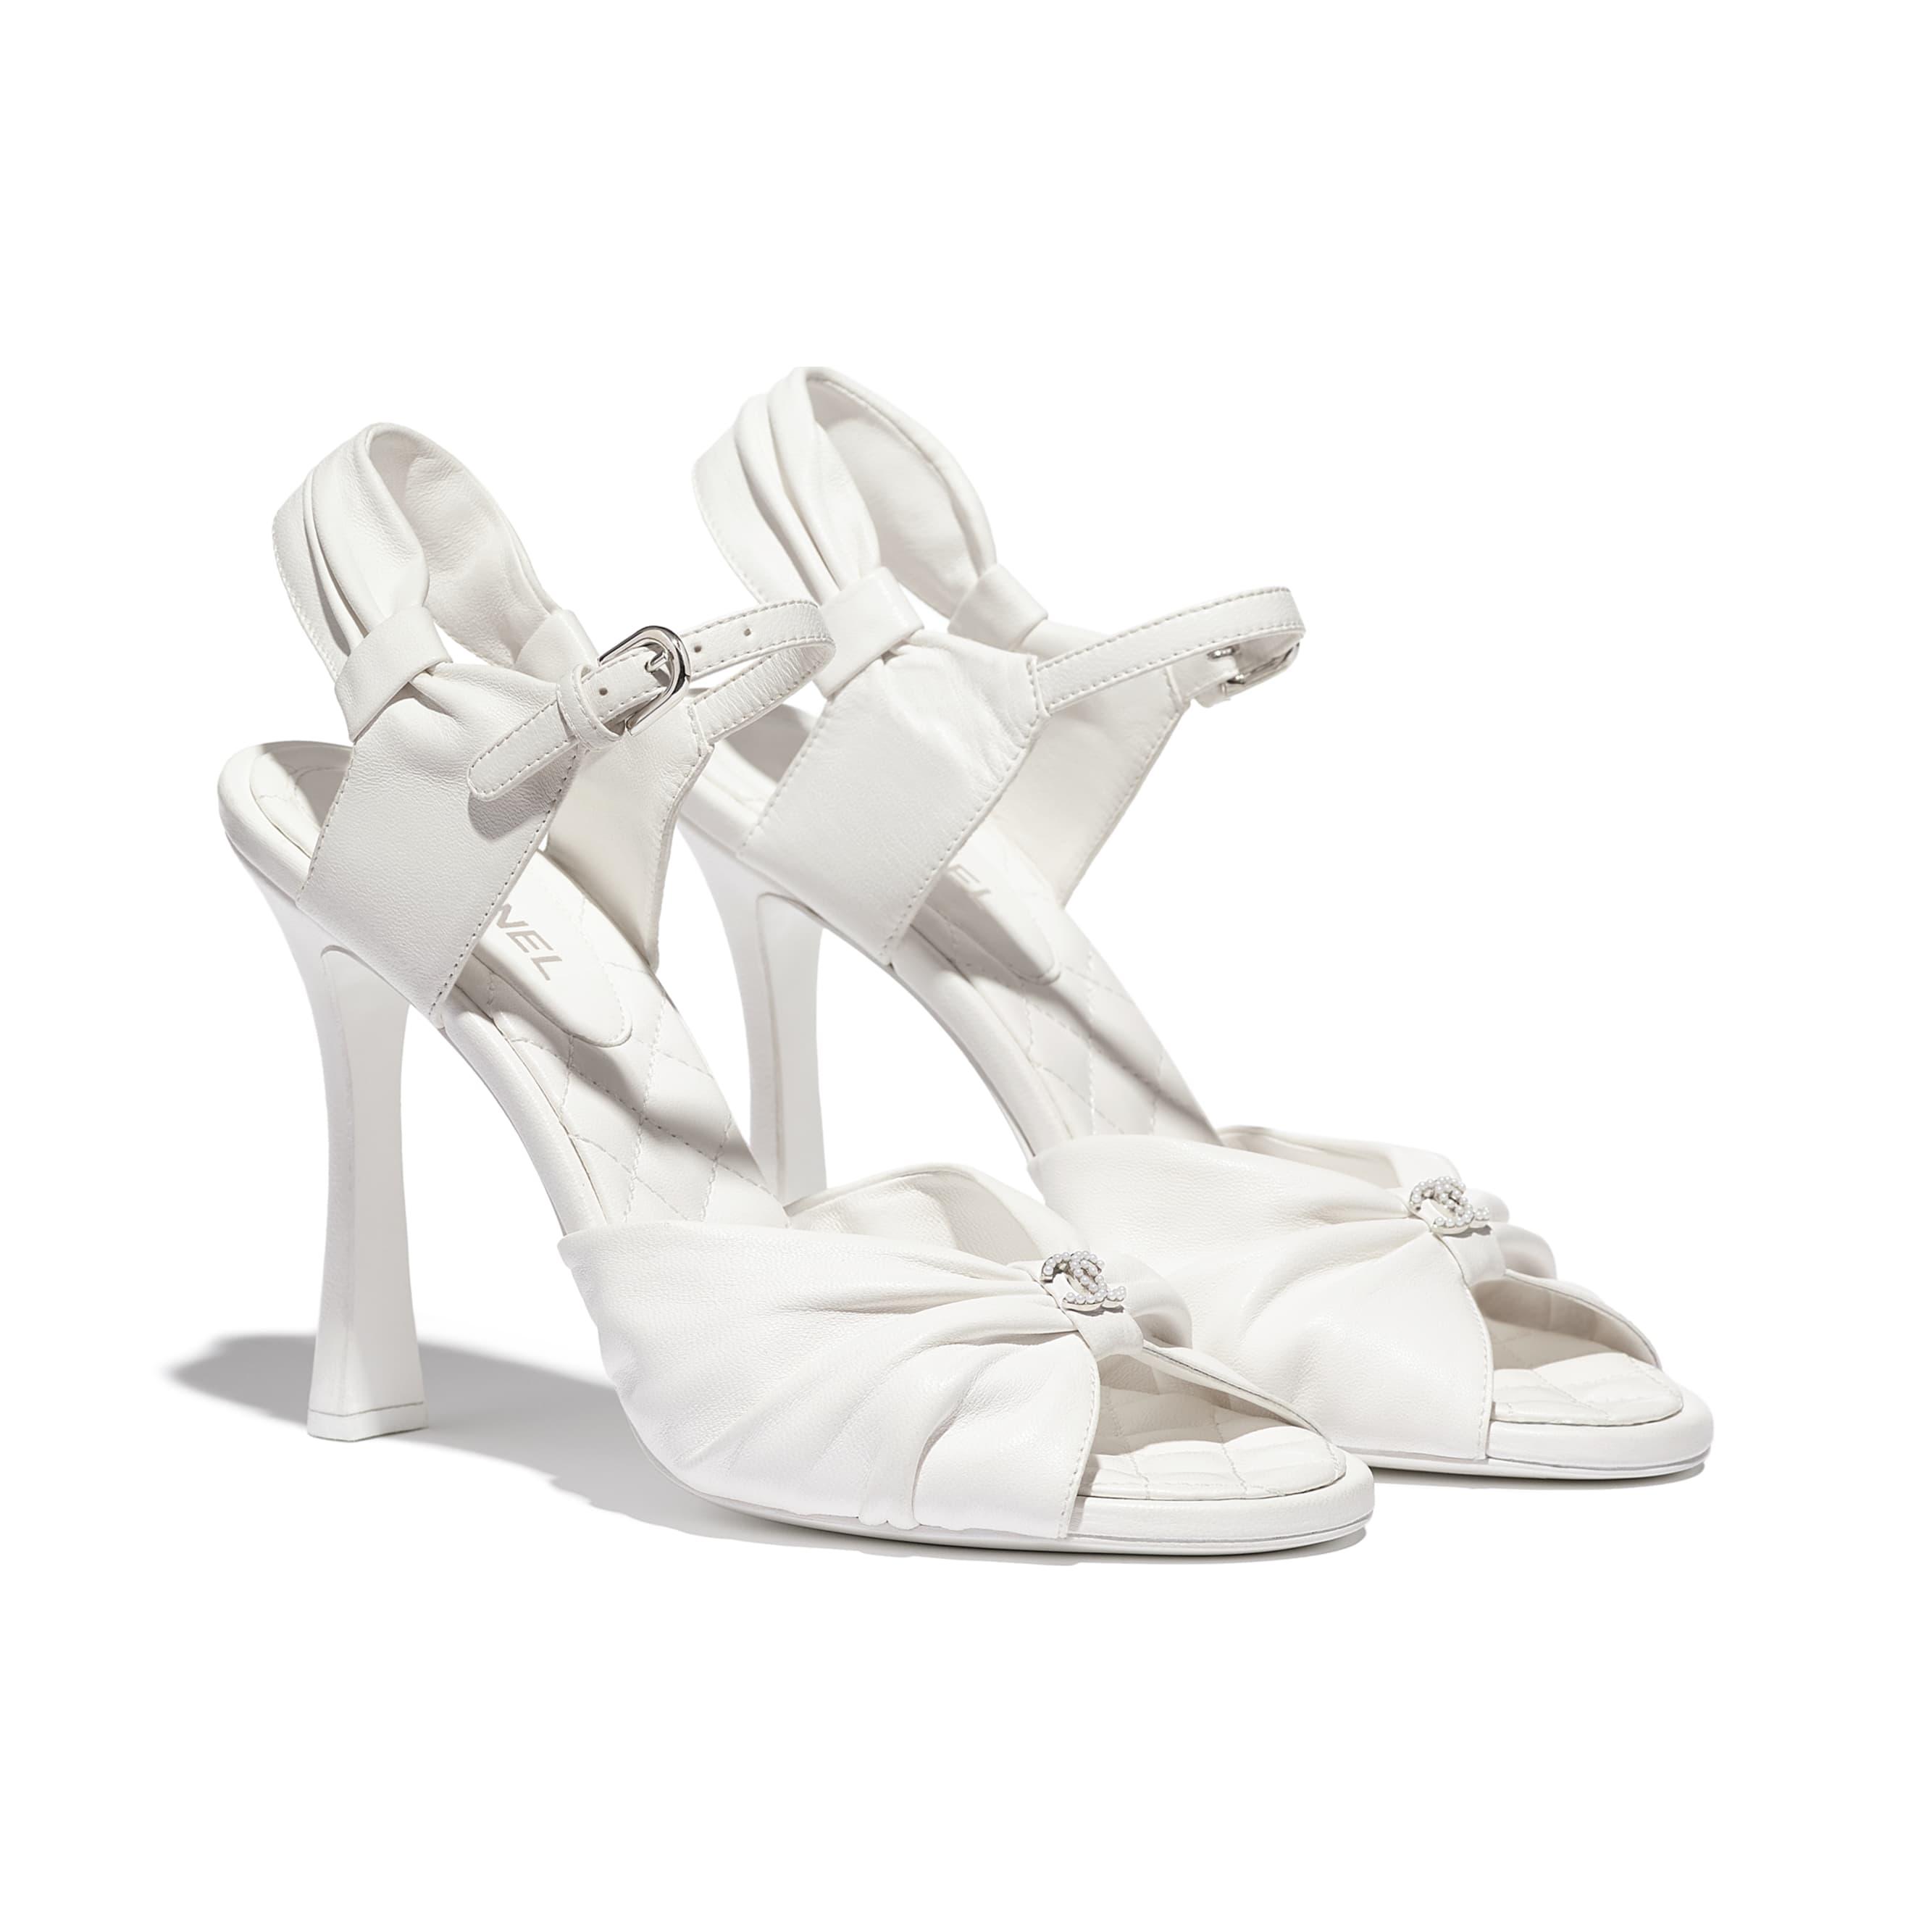 Sandals - White - Lambskin - CHANEL - Alternative view - see standard sized version